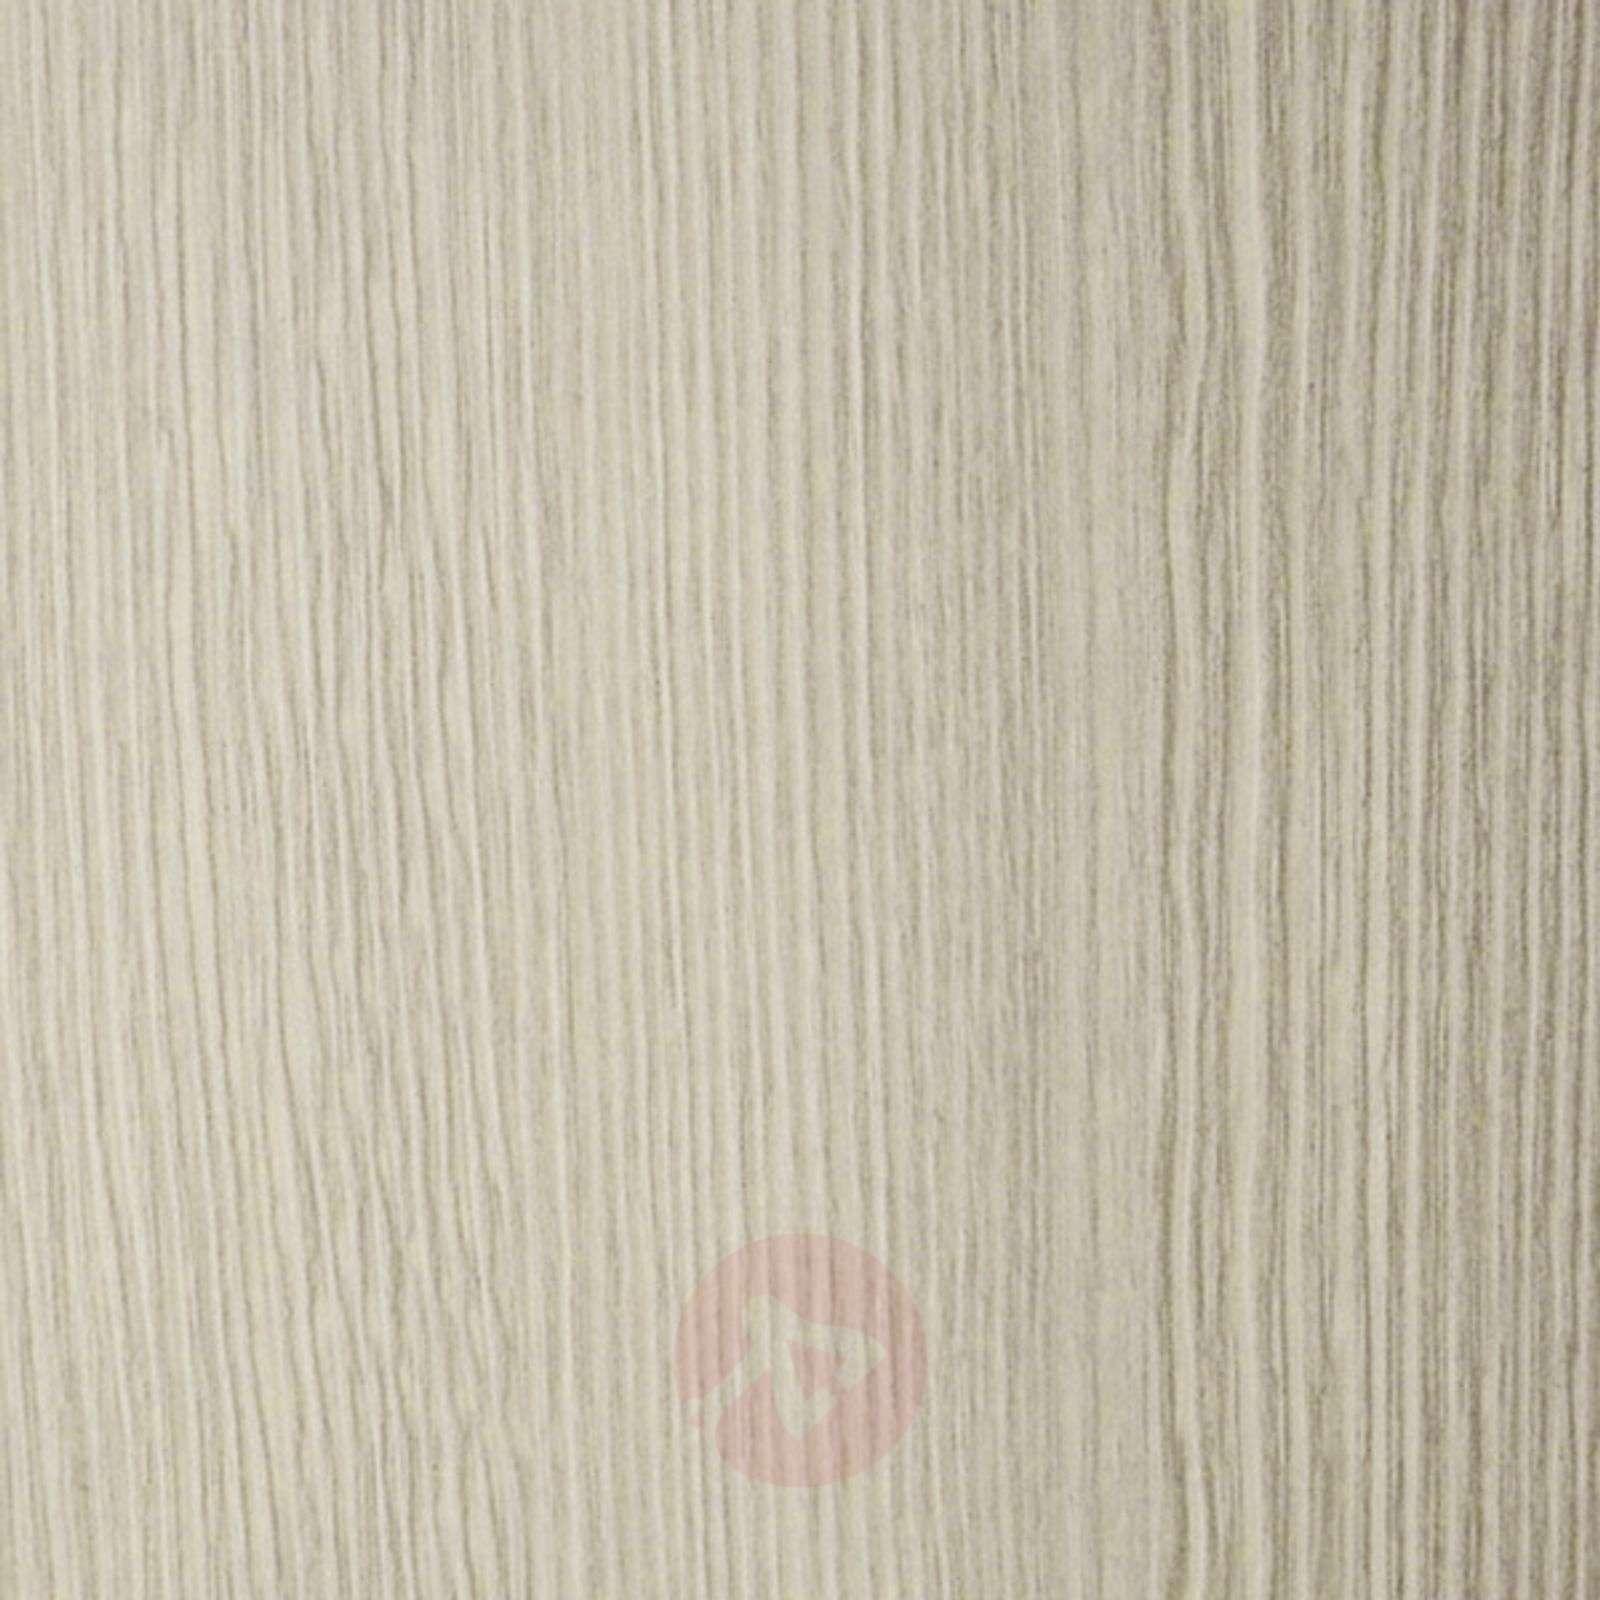 Larch wood ceiling light Sky Mini Alien ice grey-1056074-01